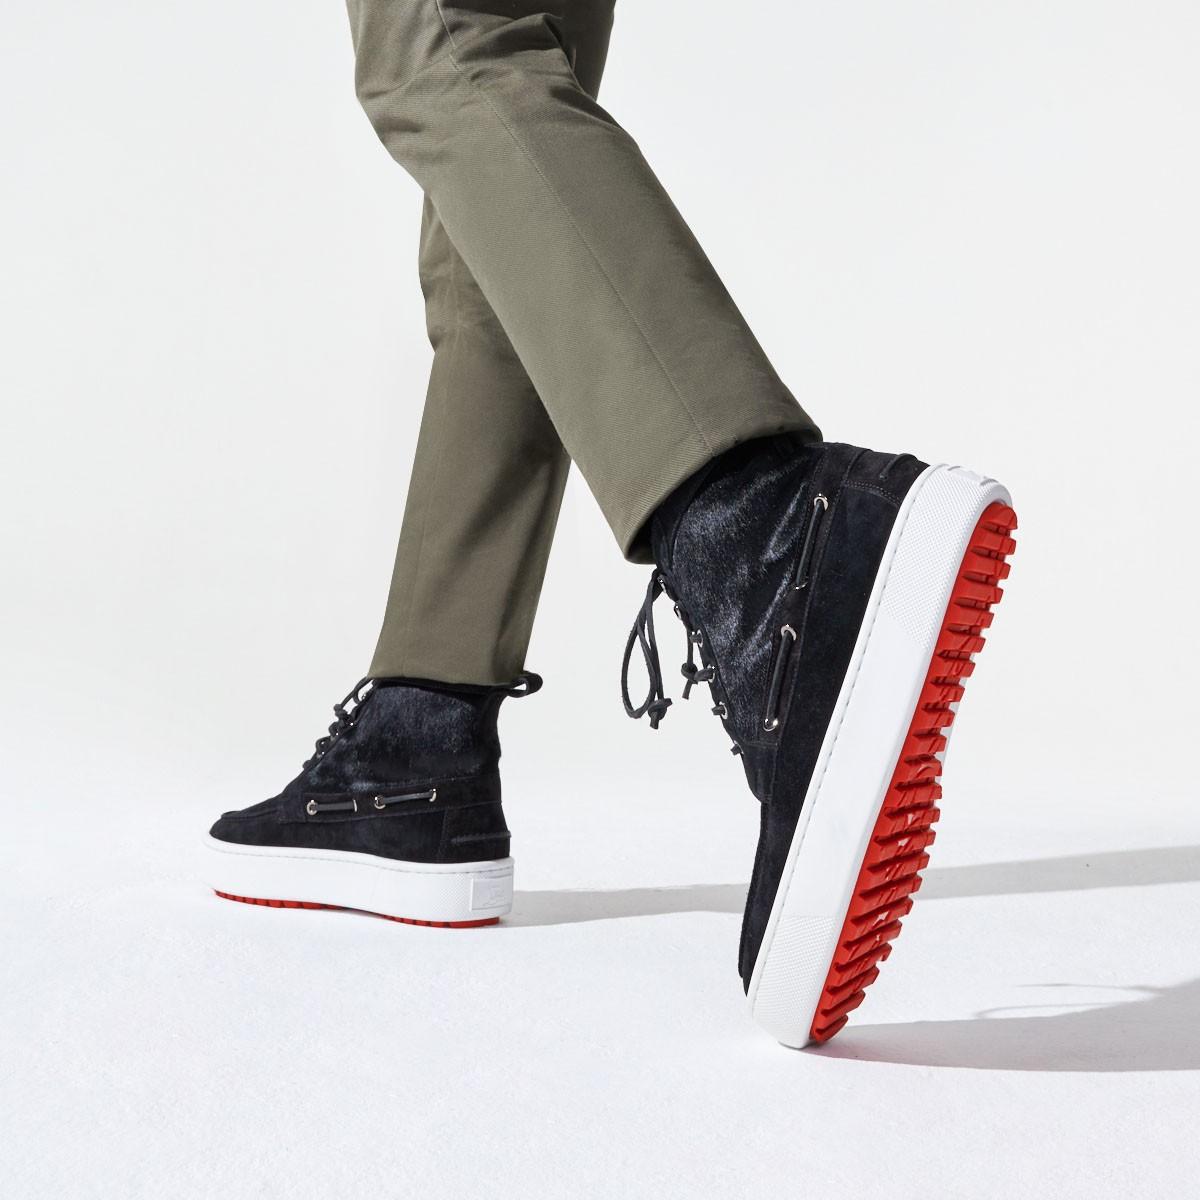 Shoes - Torontoto - Christian Louboutin